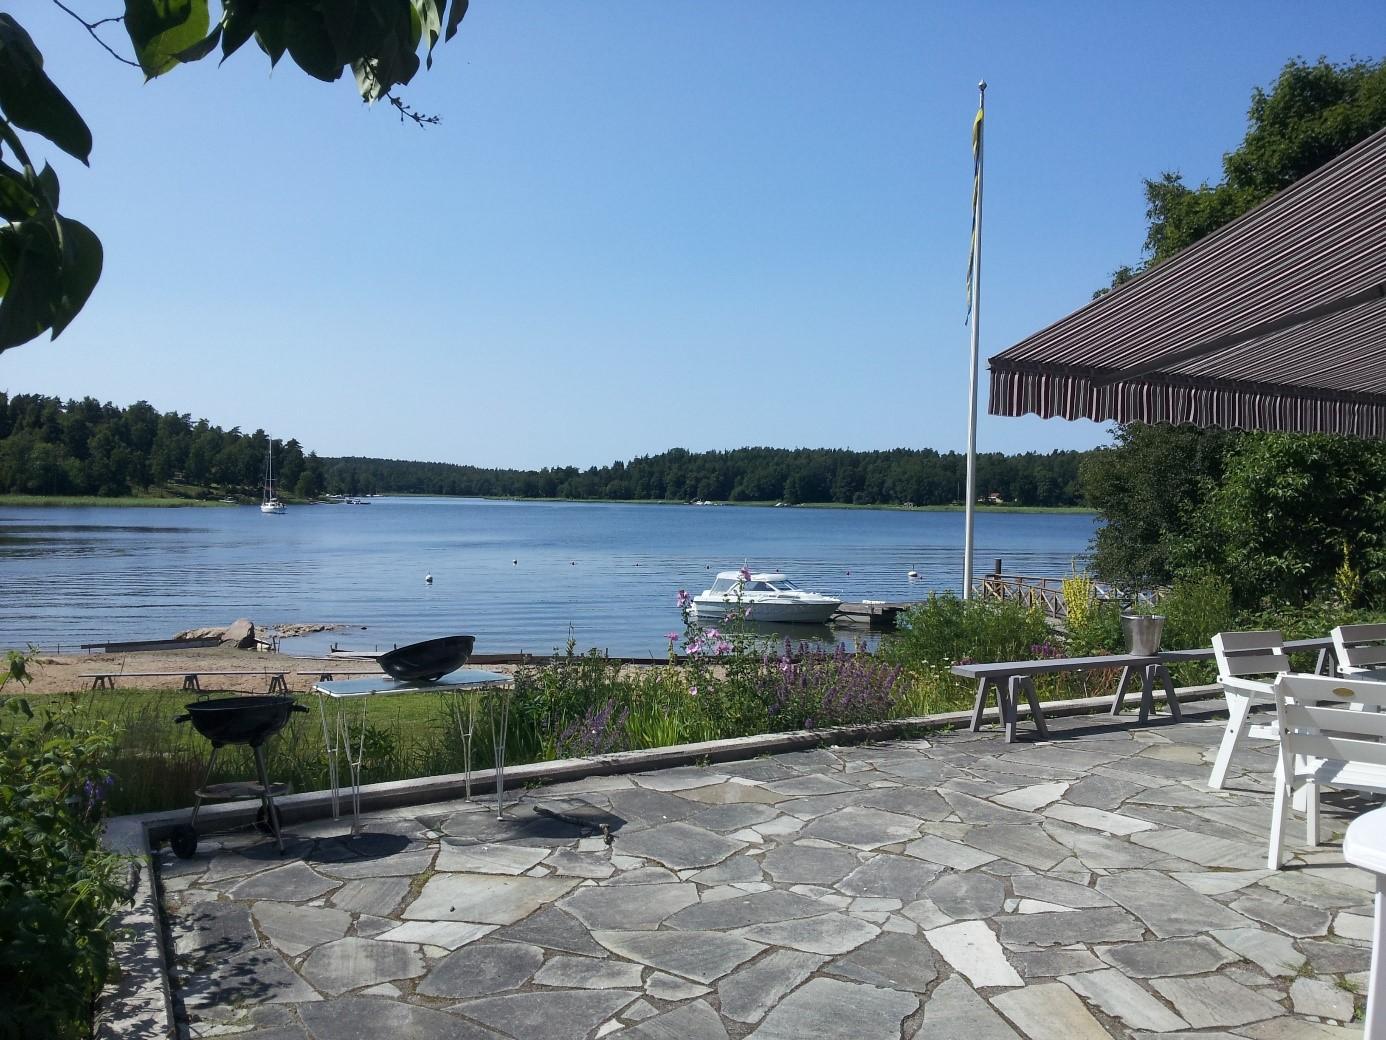 Stensundet